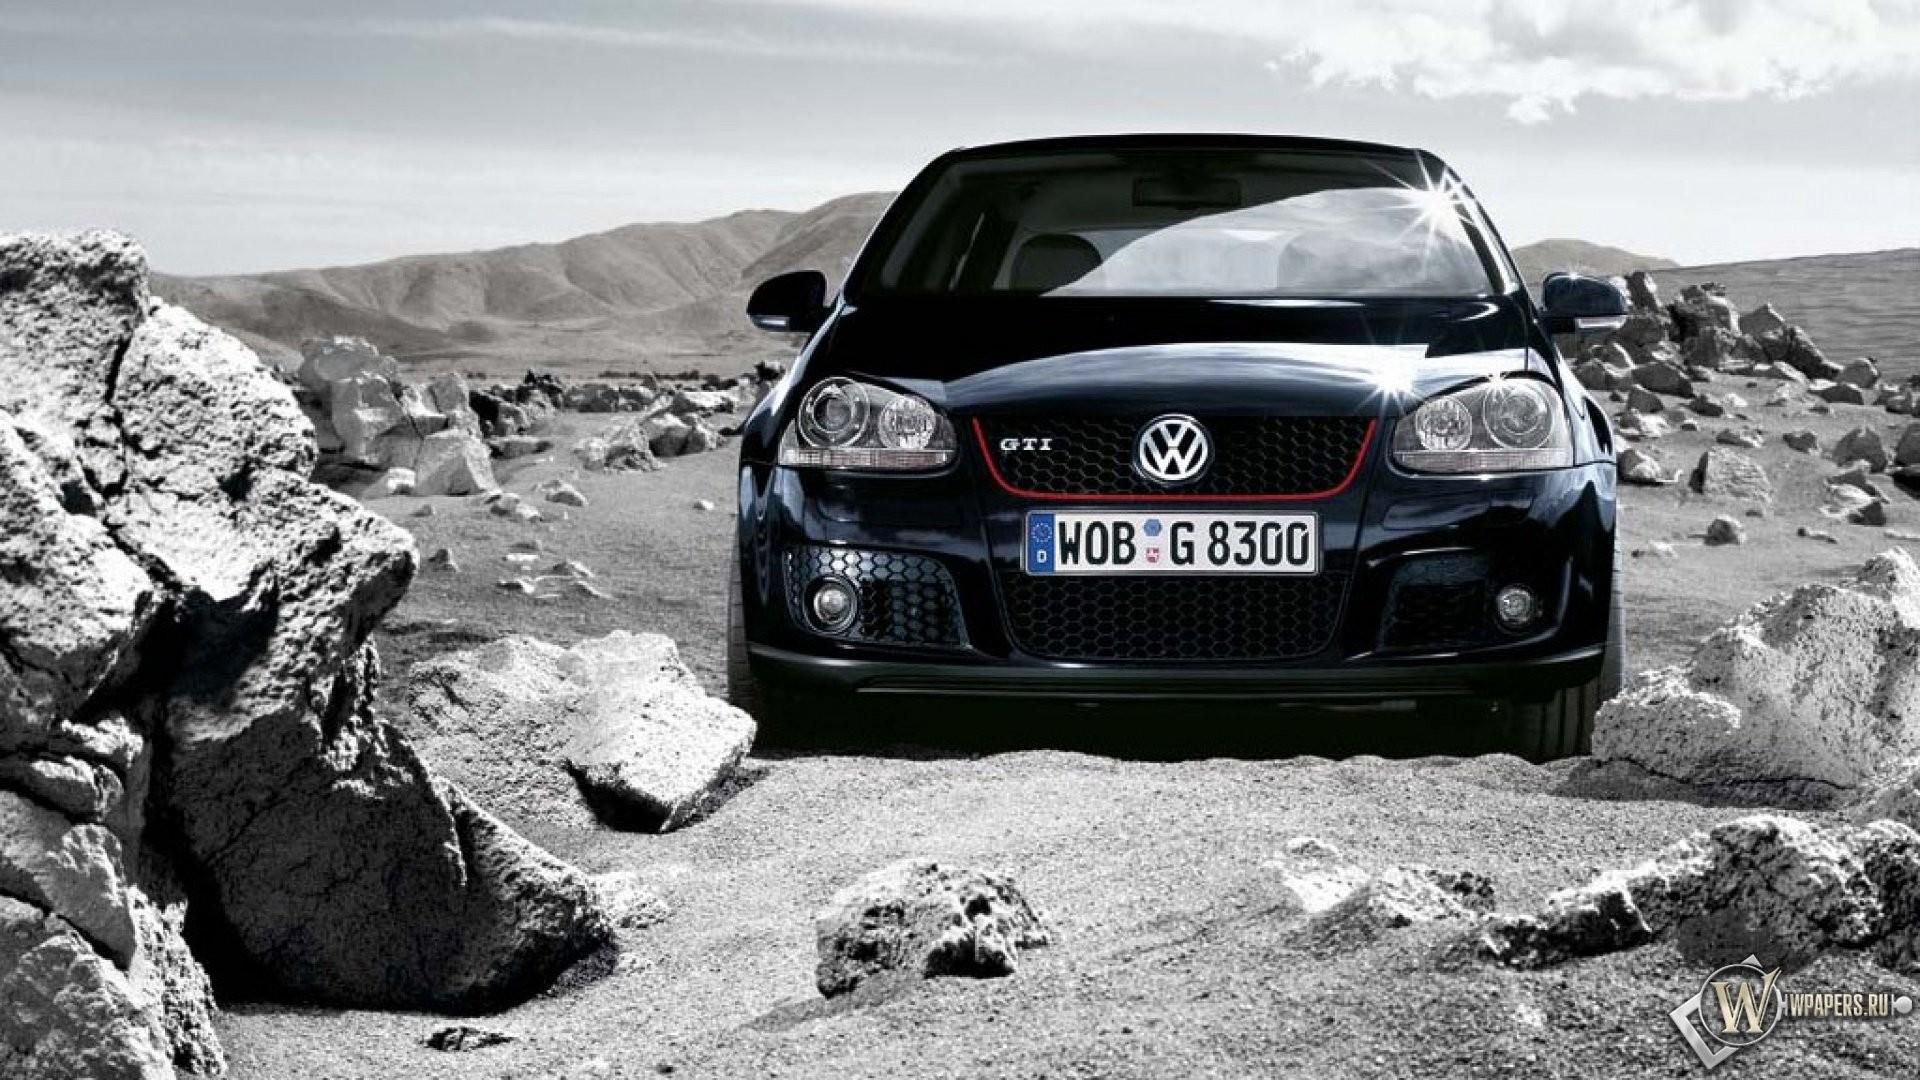 VW Golf Wallpaper Full HD for Desktop Background Wallpaper HD Resolution  px 433.45 KB